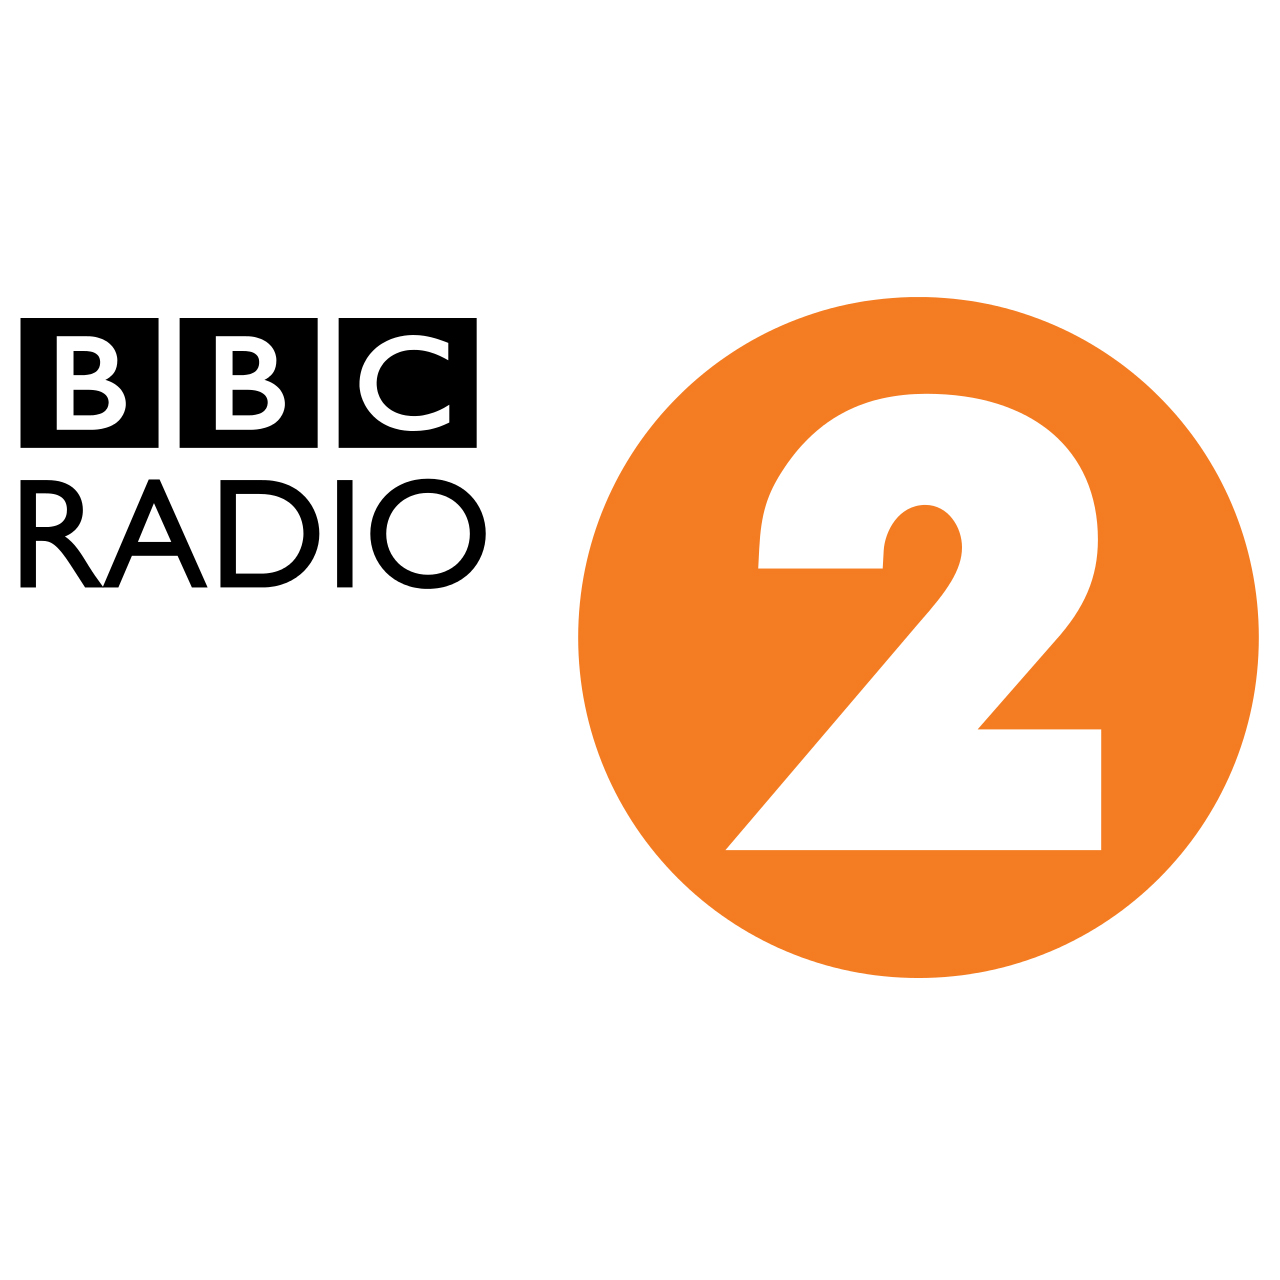 listen to us on radio 2 - north london hearing